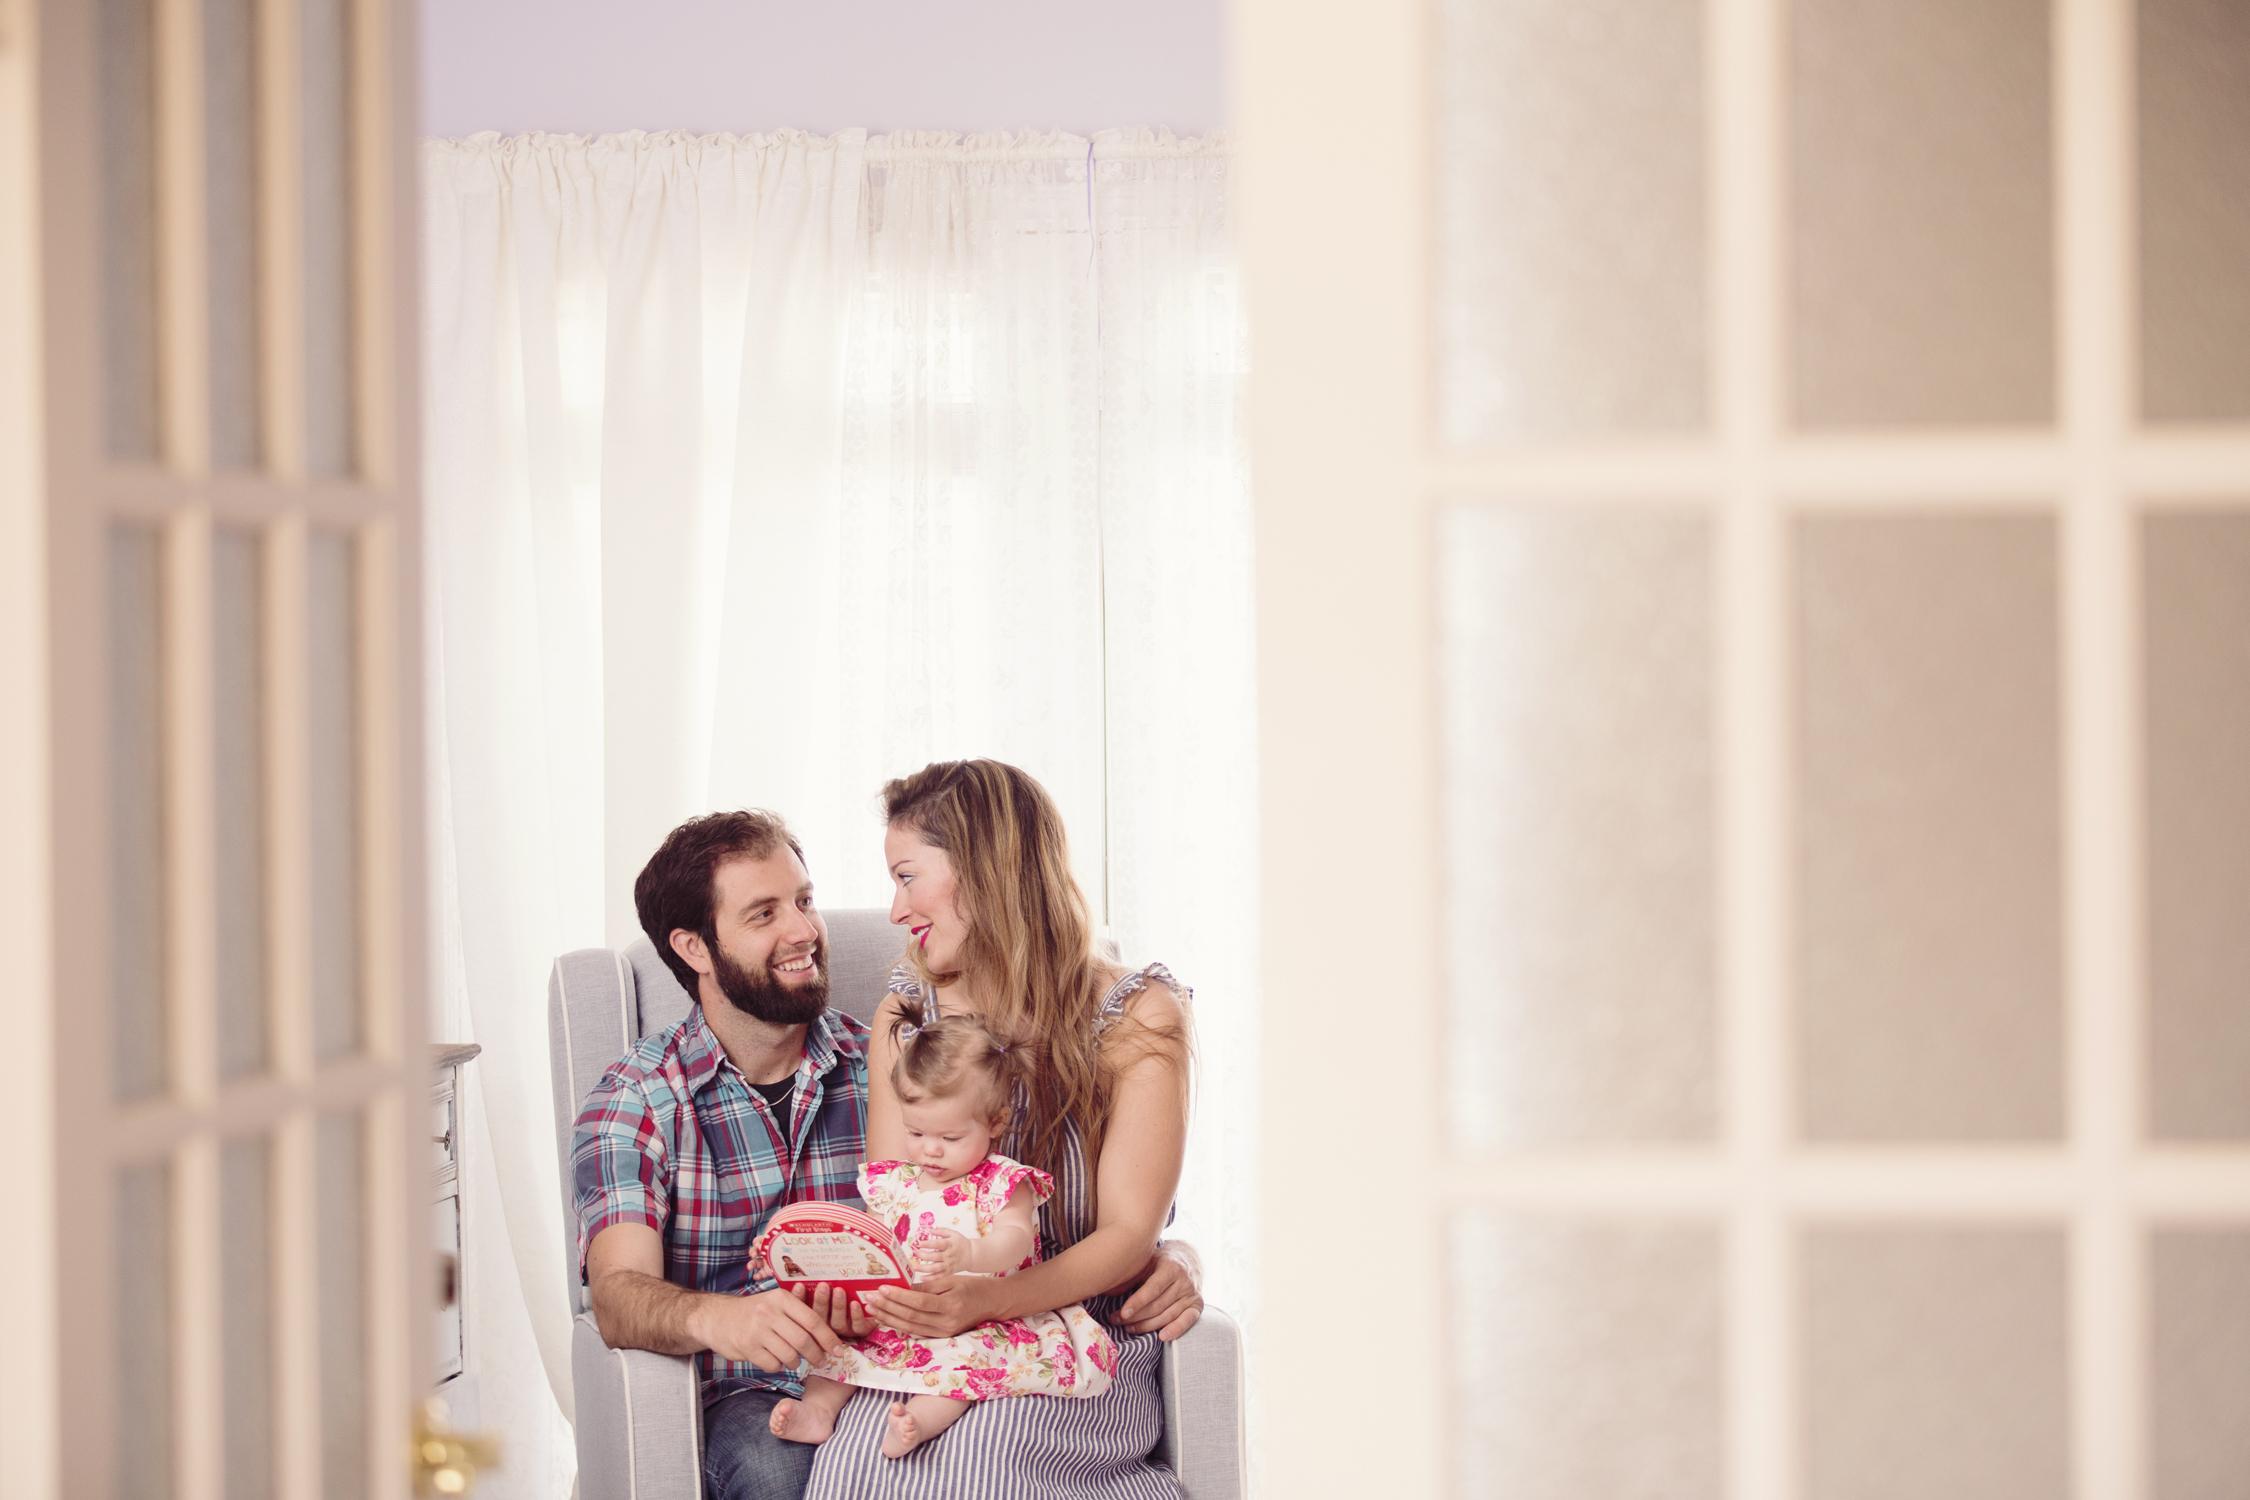 Sudbury-Photographer-Lifestyle-Portrait-family-baby-newborn